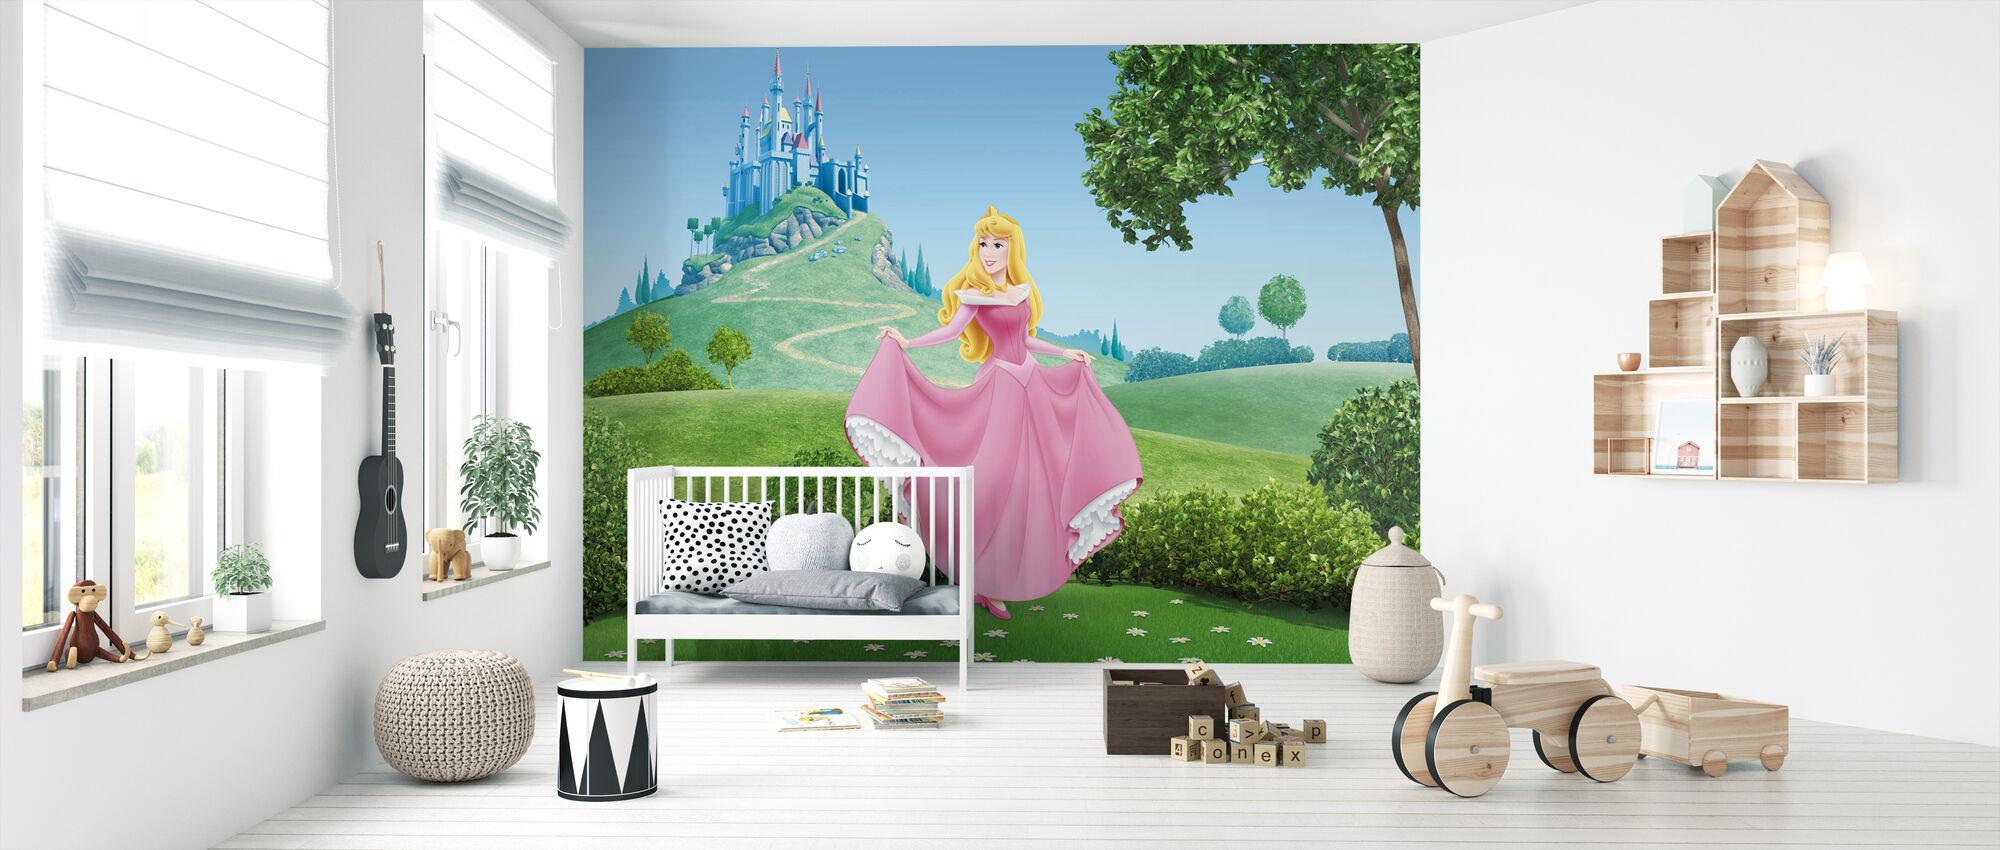 Prinsessa - Sleeping Beauty - Tapetti - Vauvan huone